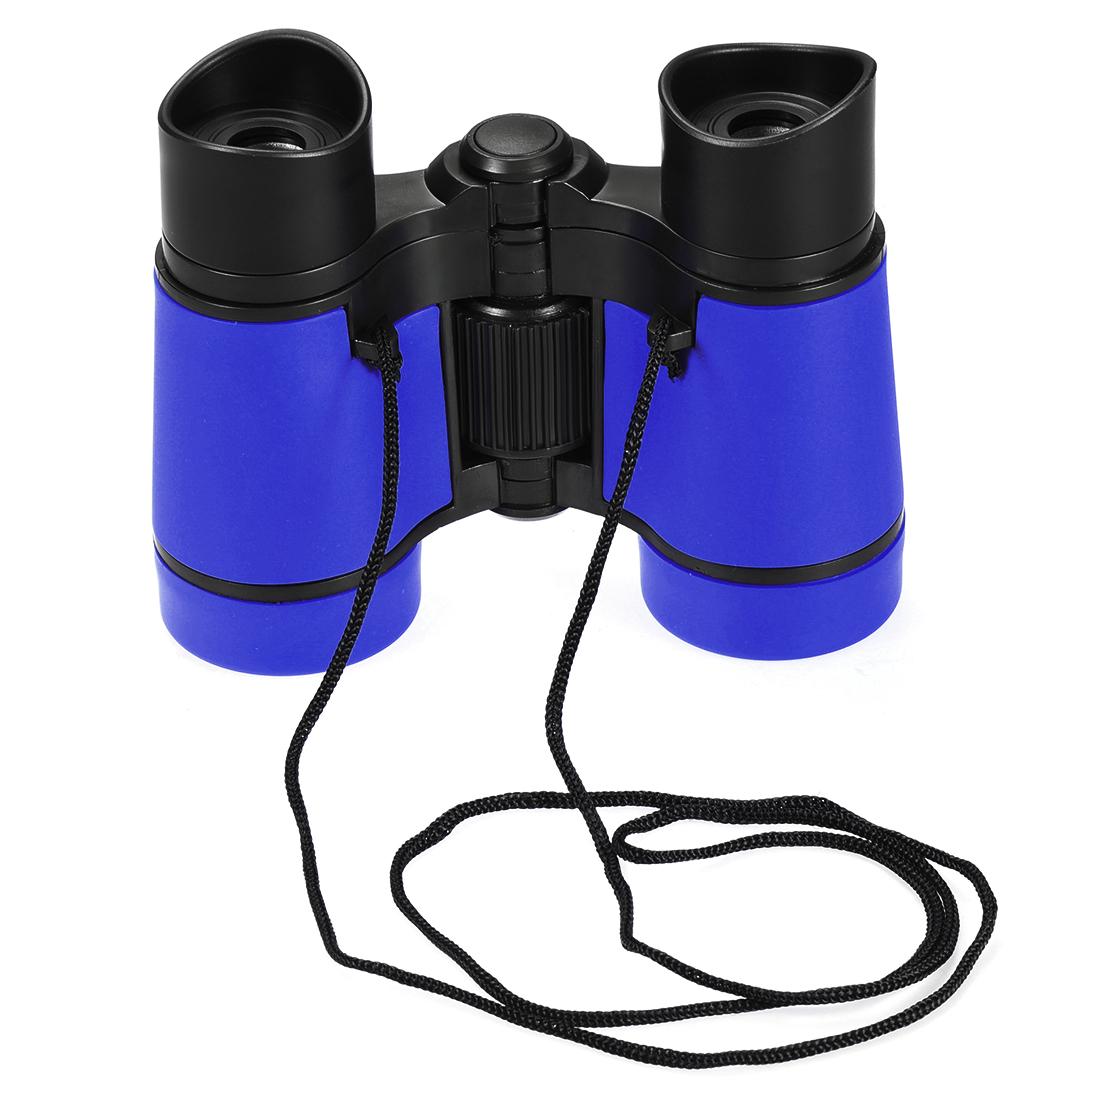 Toy Binoculars 4X30 Compact Foldable Binoculars Shock Proof Blue with Neck Strap